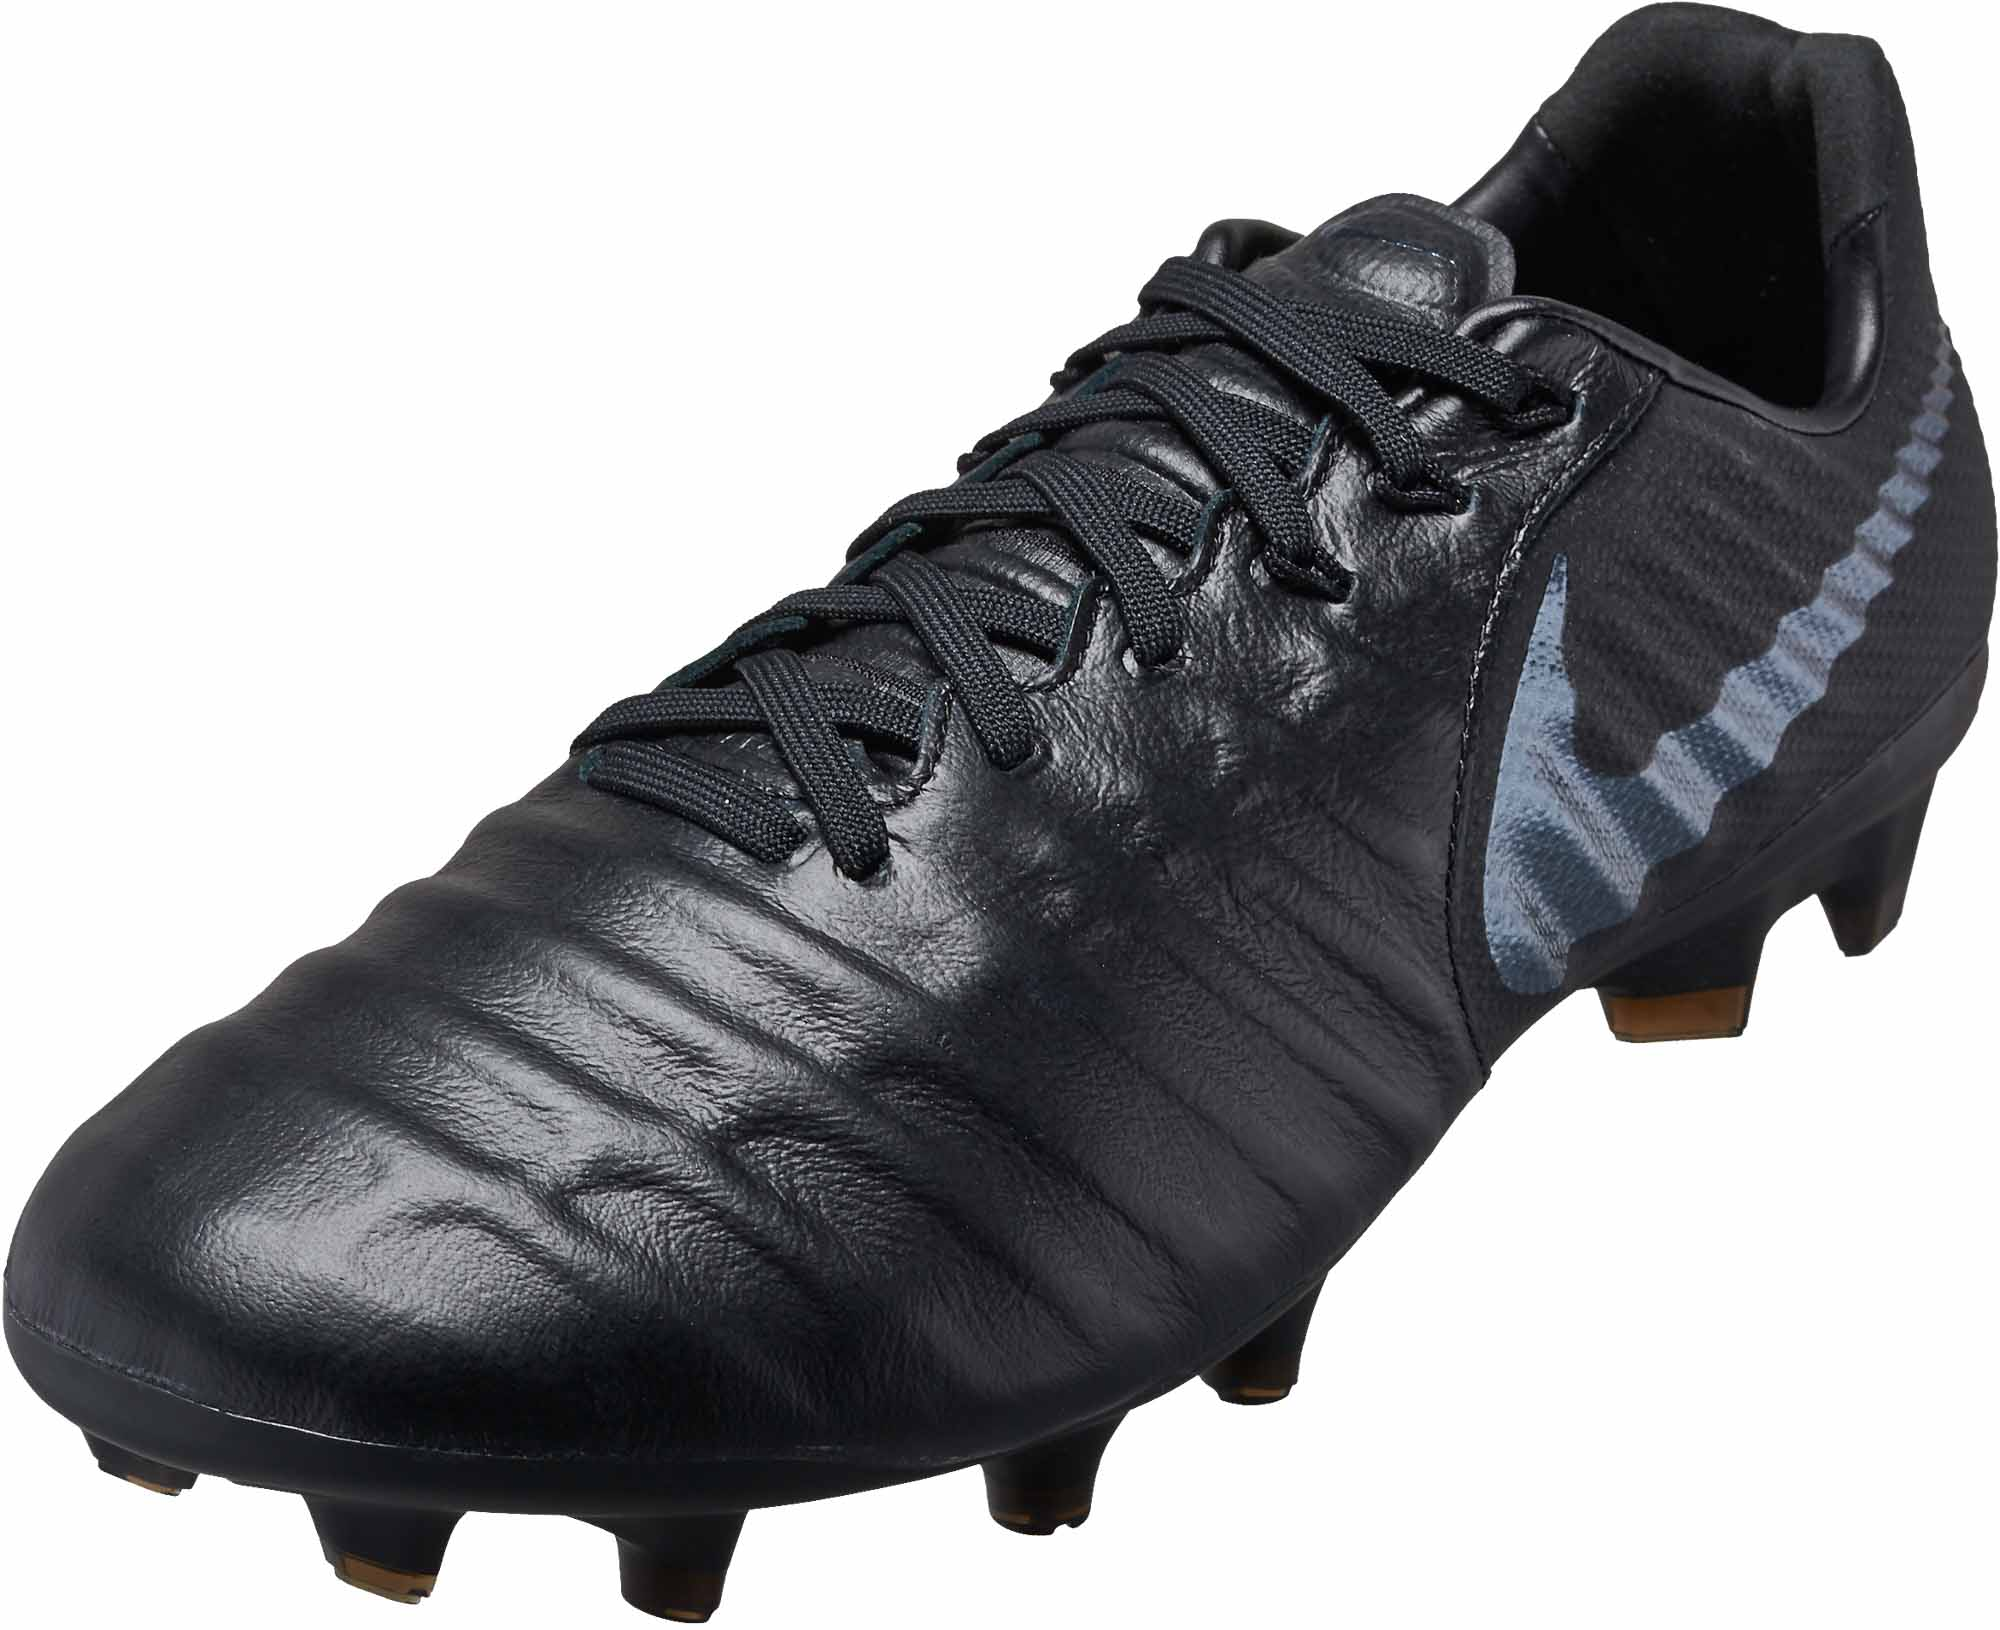 Nike Tiempo Legend 7 Pro FG - Black Black - SoccerPro f0523923de4f